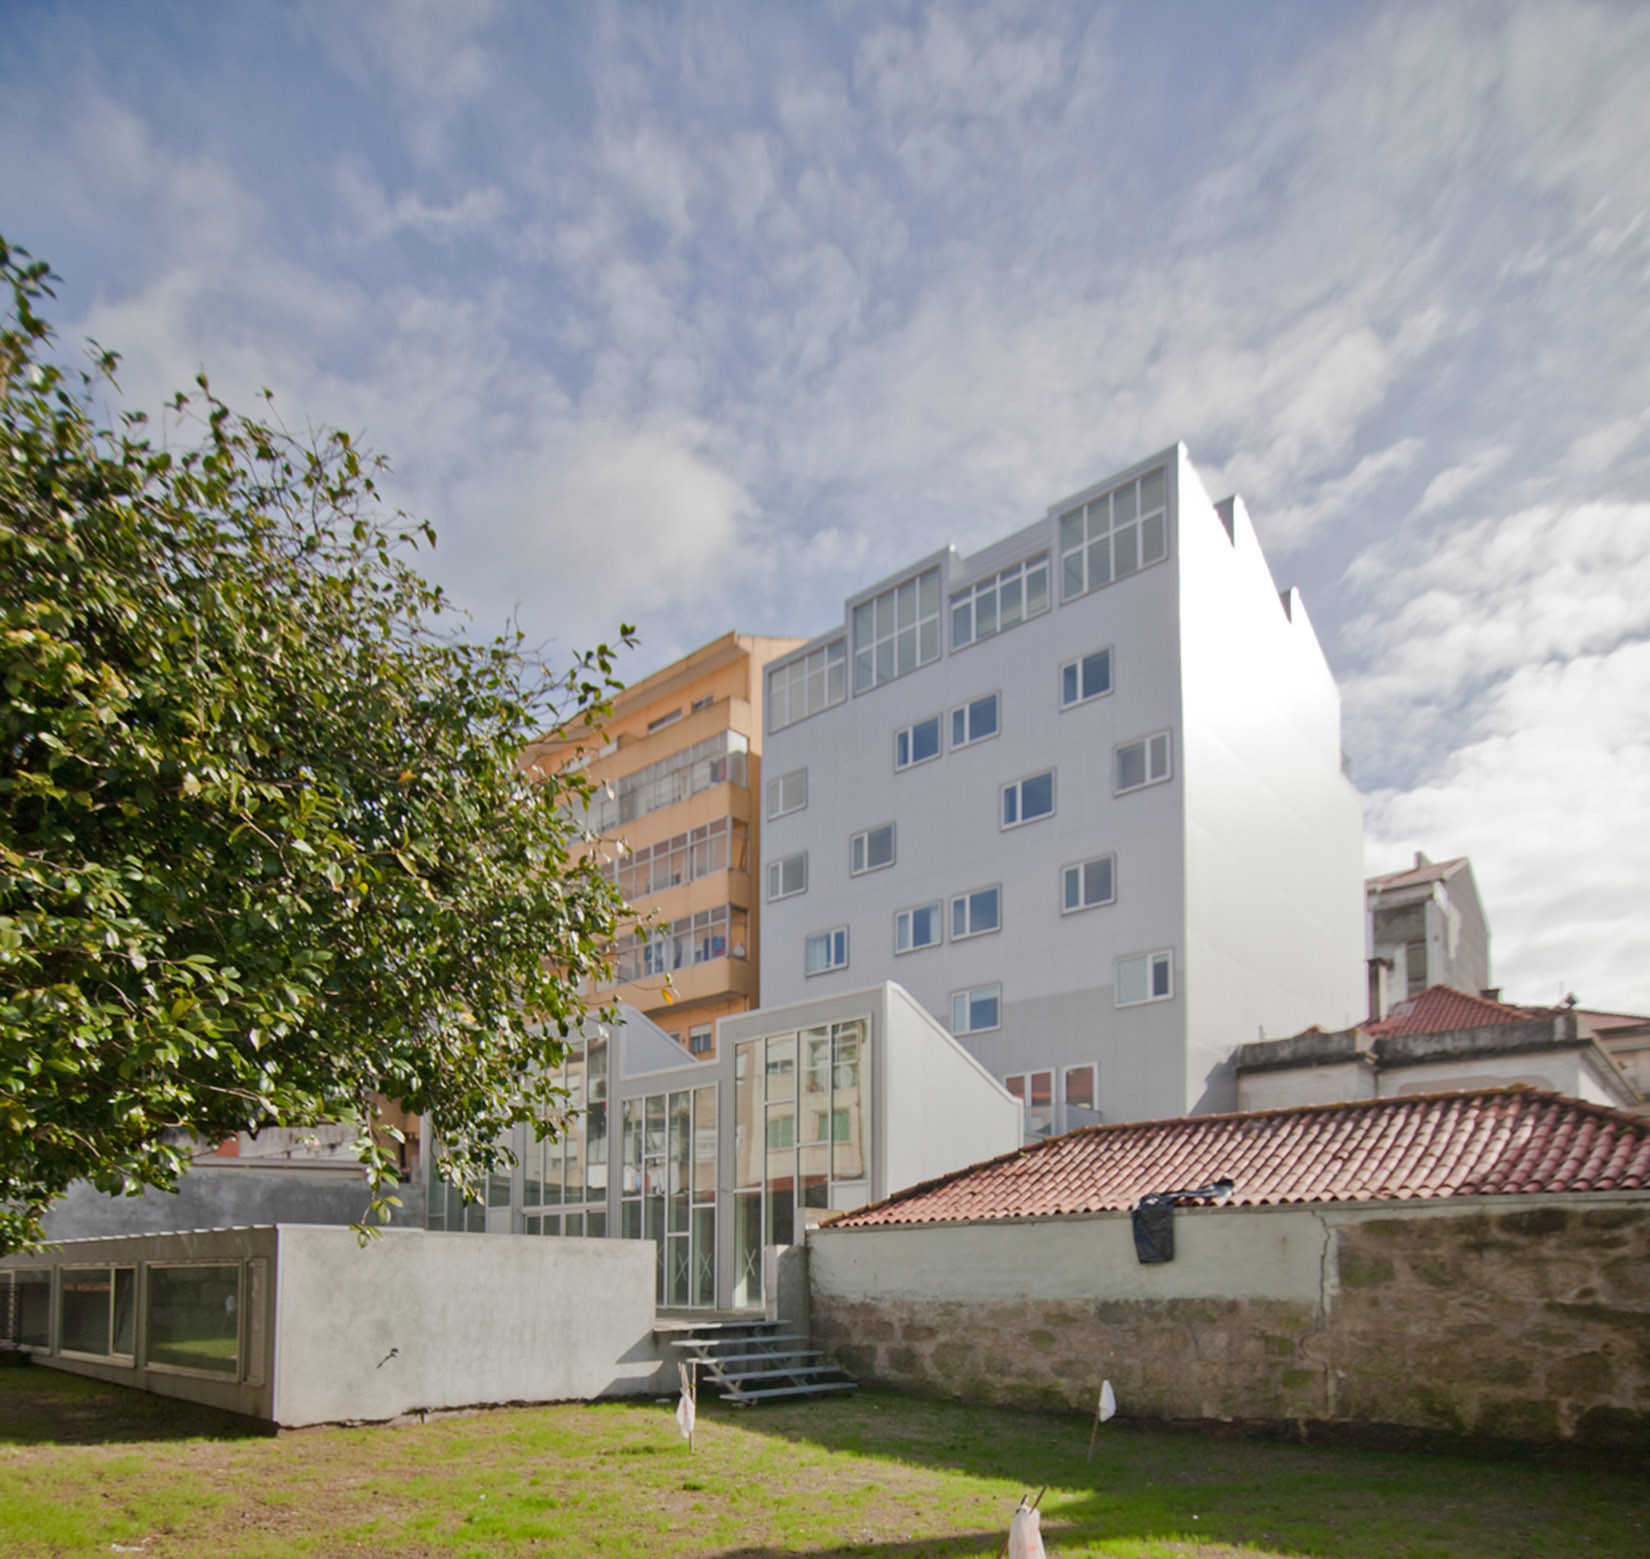 79 Building / Pedro Mendes Arquitectos, © Jorge Lopez Conde